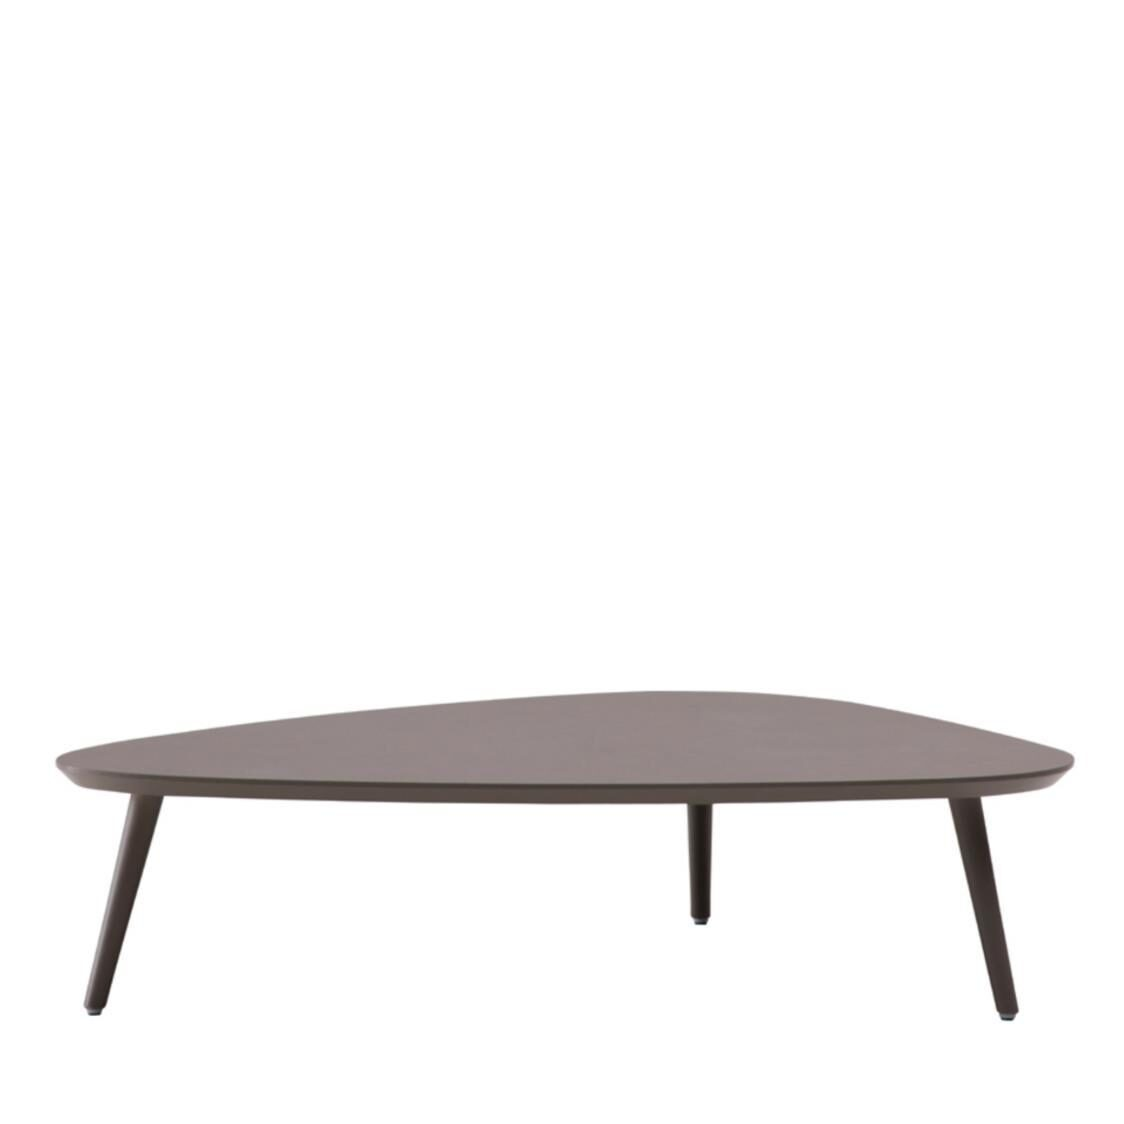 Iloom Mu 1200W Sofa Table GU Low Legs